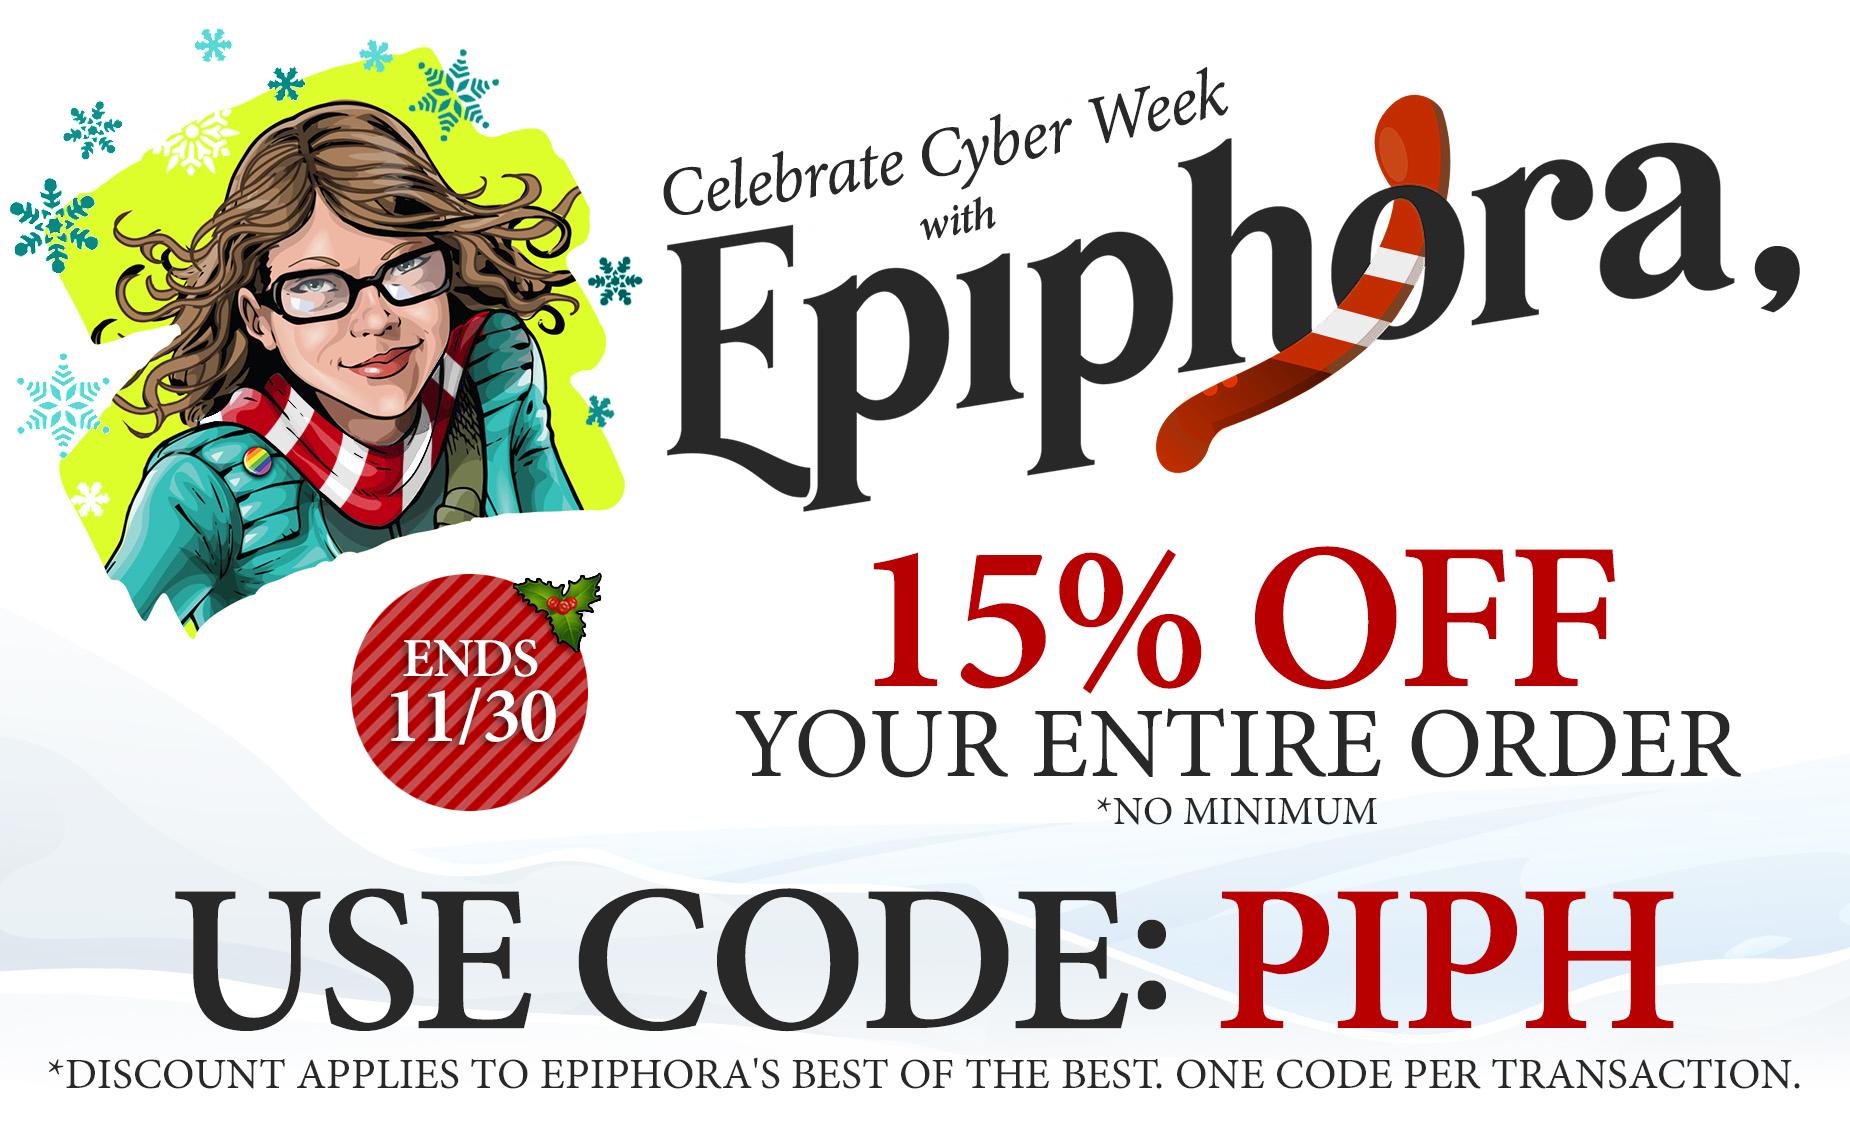 Epiphora's Best Of The Best